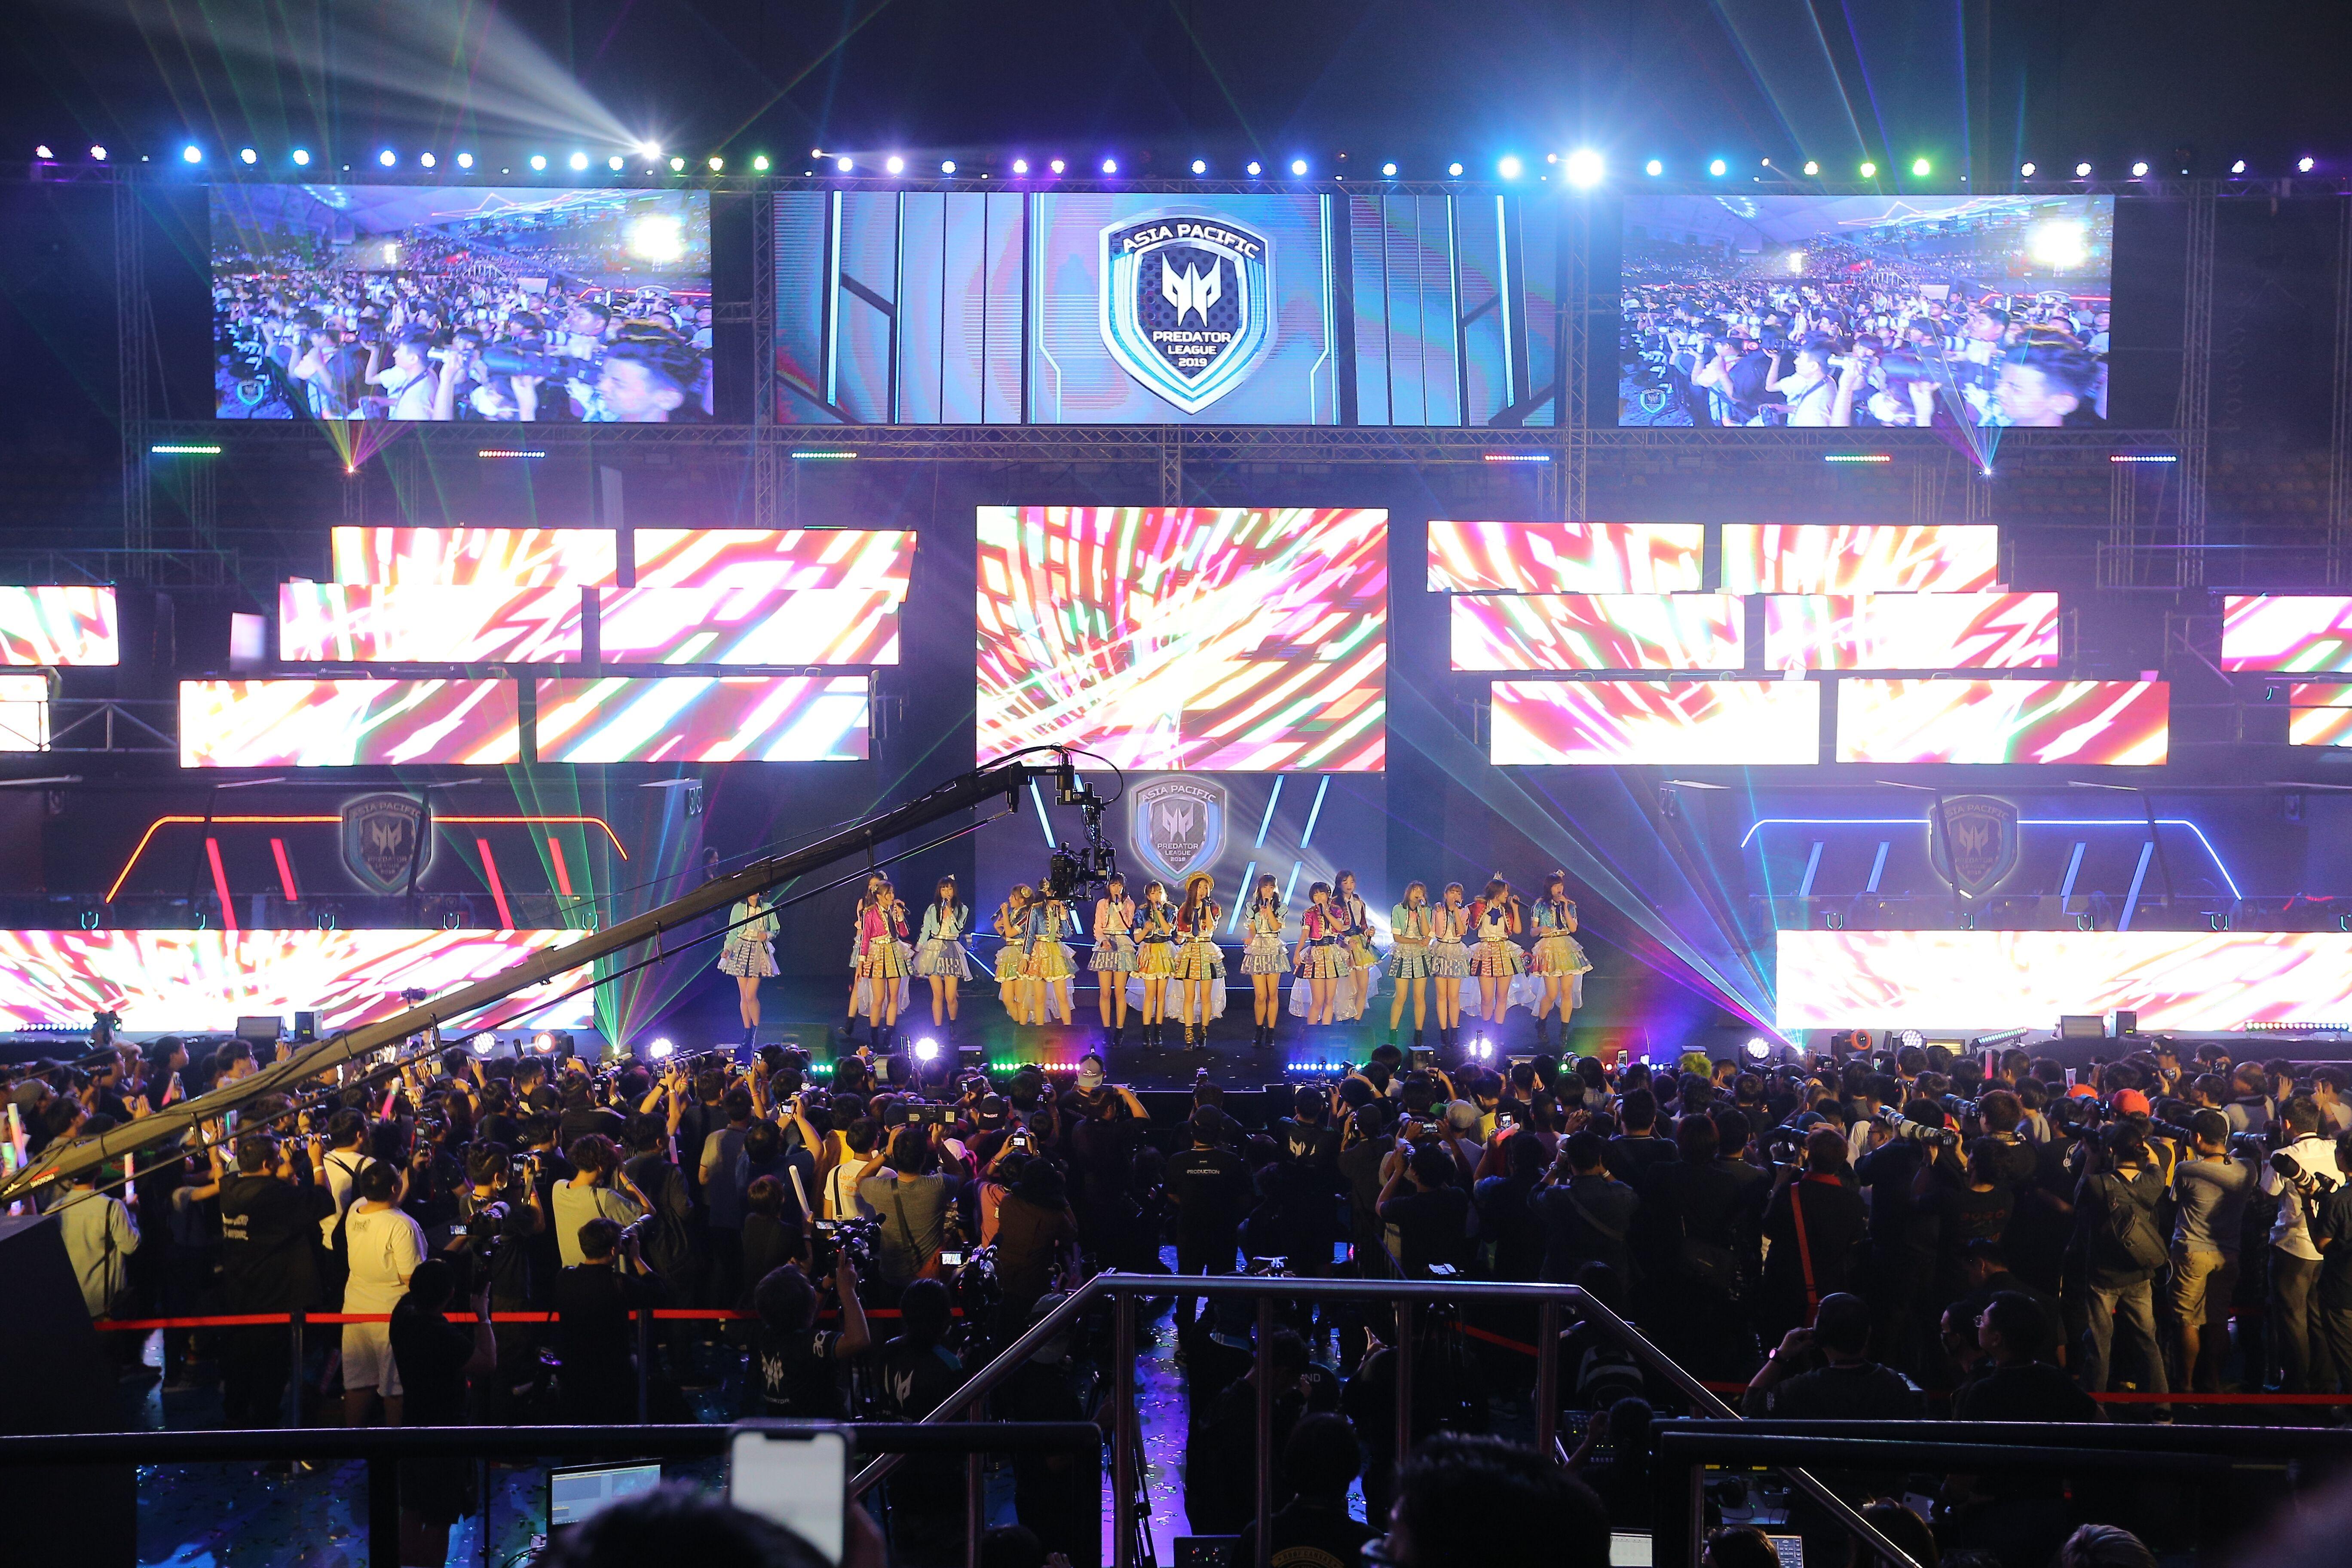 c3lowk72 jpeg บรรยากาศงาน Asia Pacific Predator League 2019 สุดยอดขุนพลทีมอีสปอร์ตเข้าร่วมการแข่งขันรอบแกรนด์ไฟนอล